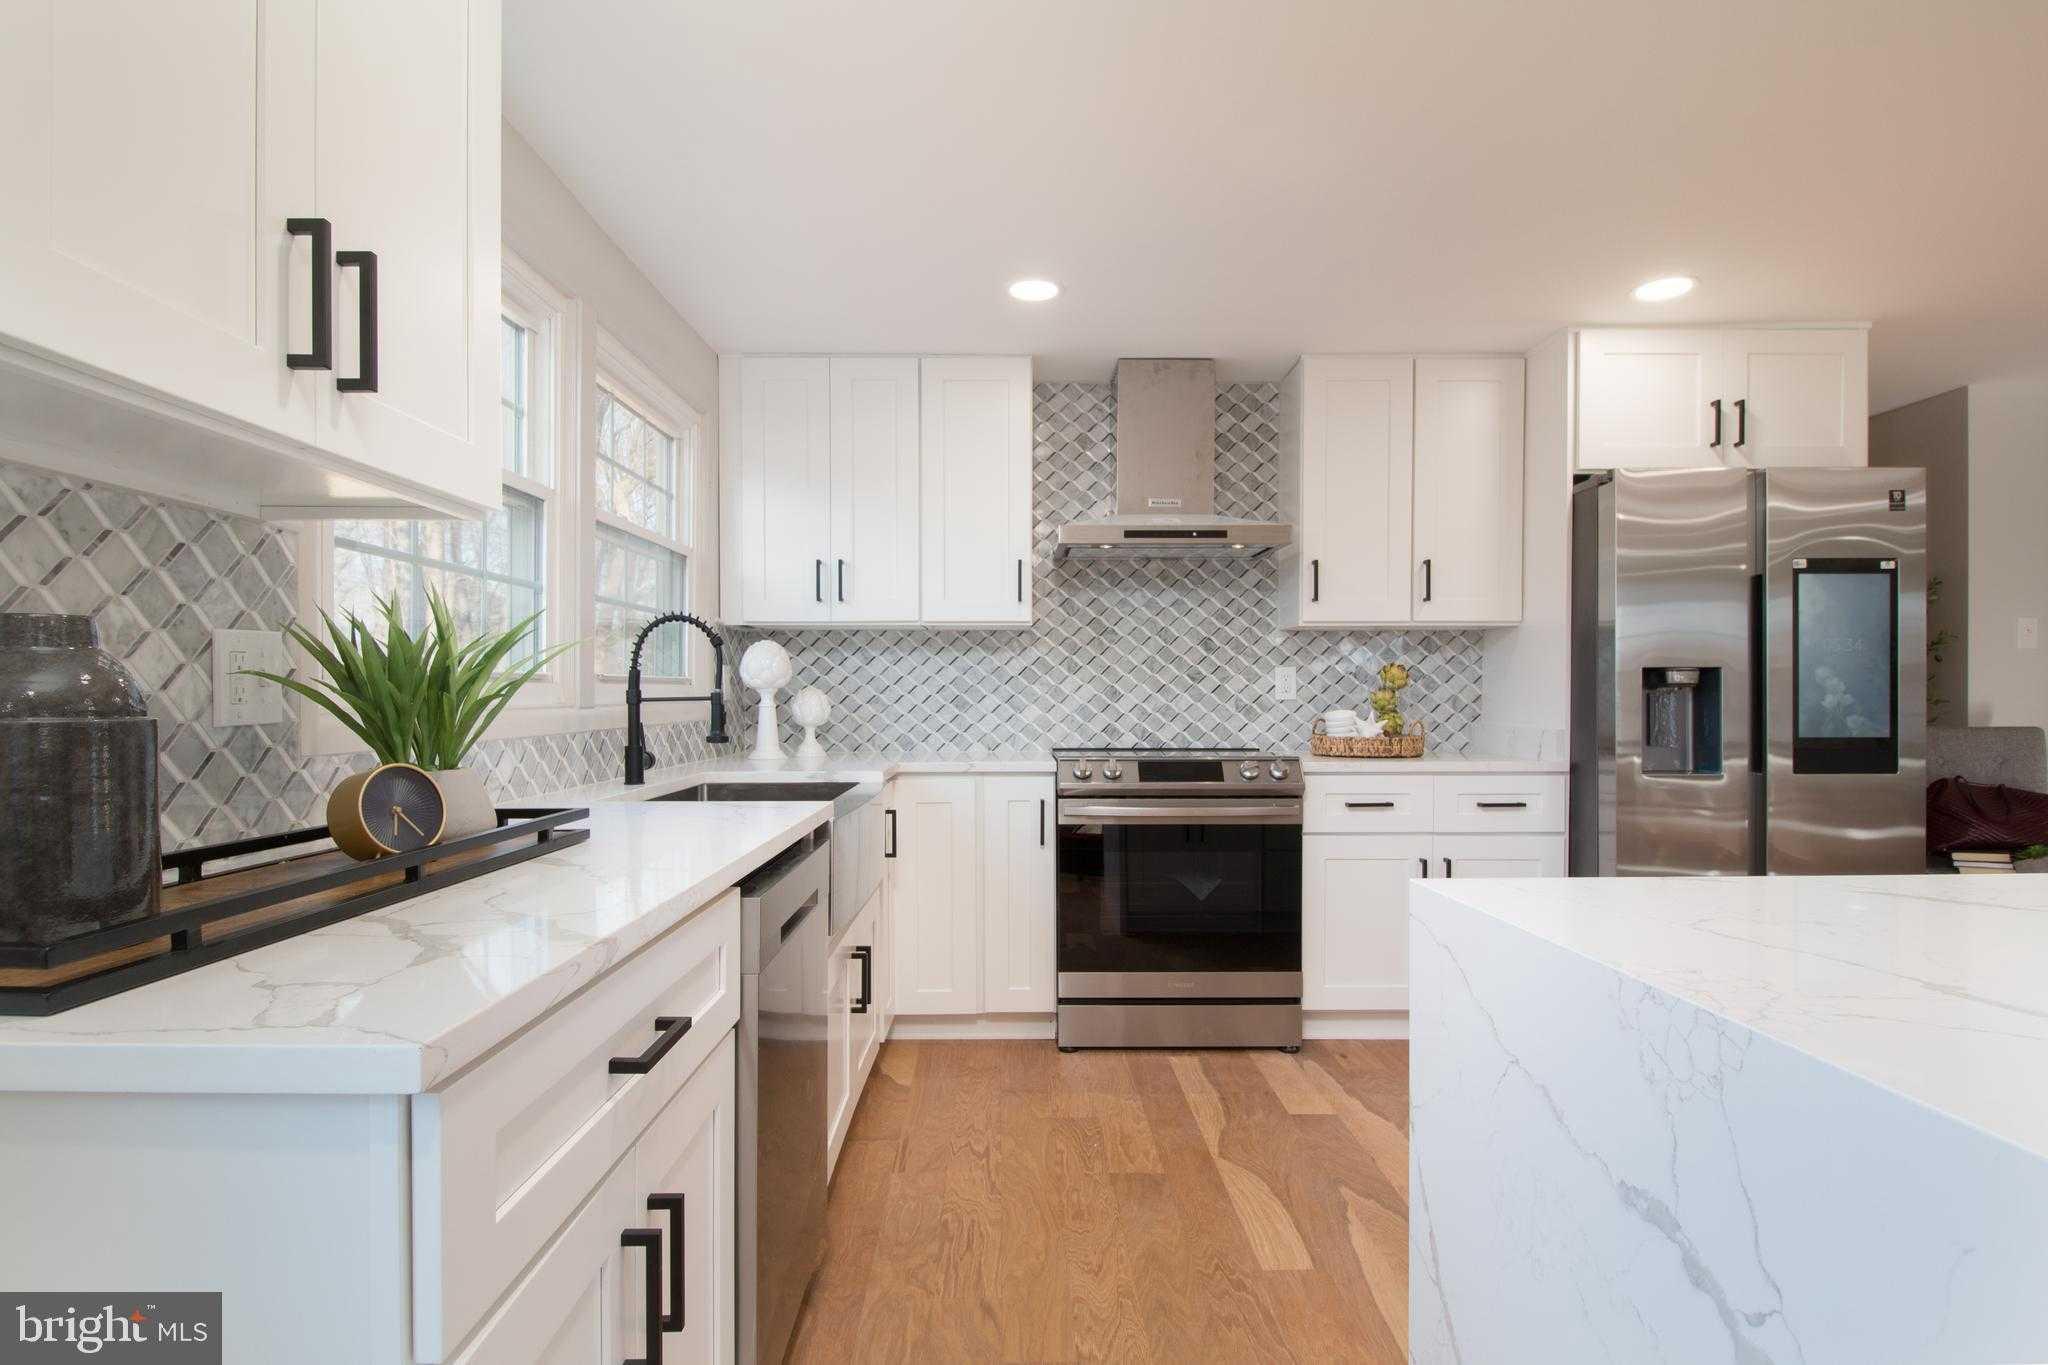 $700,000 - 5Br/3Ba -  for Sale in Greenbriar, Fairfax